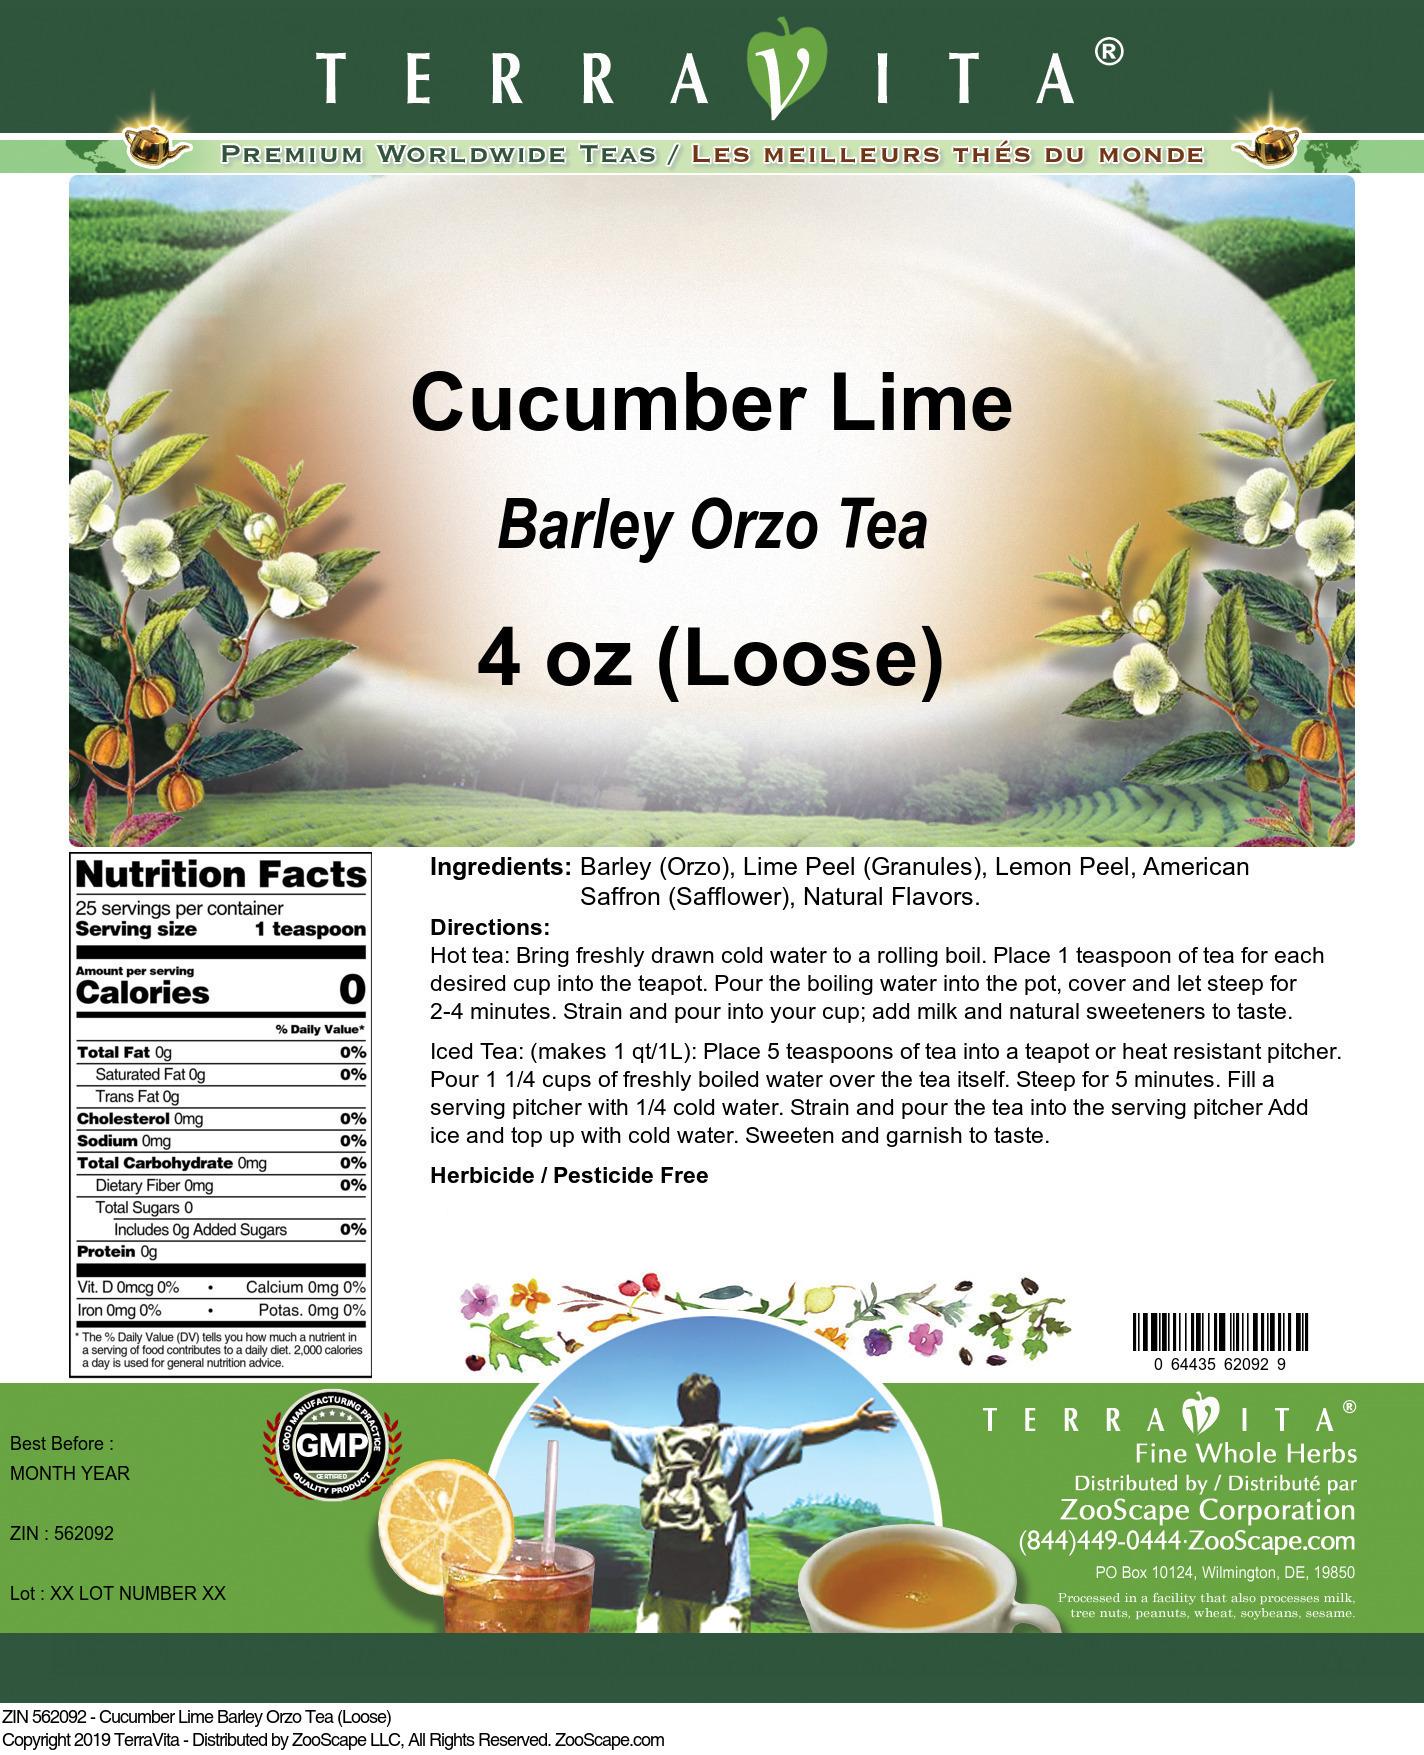 Cucumber Lime Barley Orzo Tea (Loose)